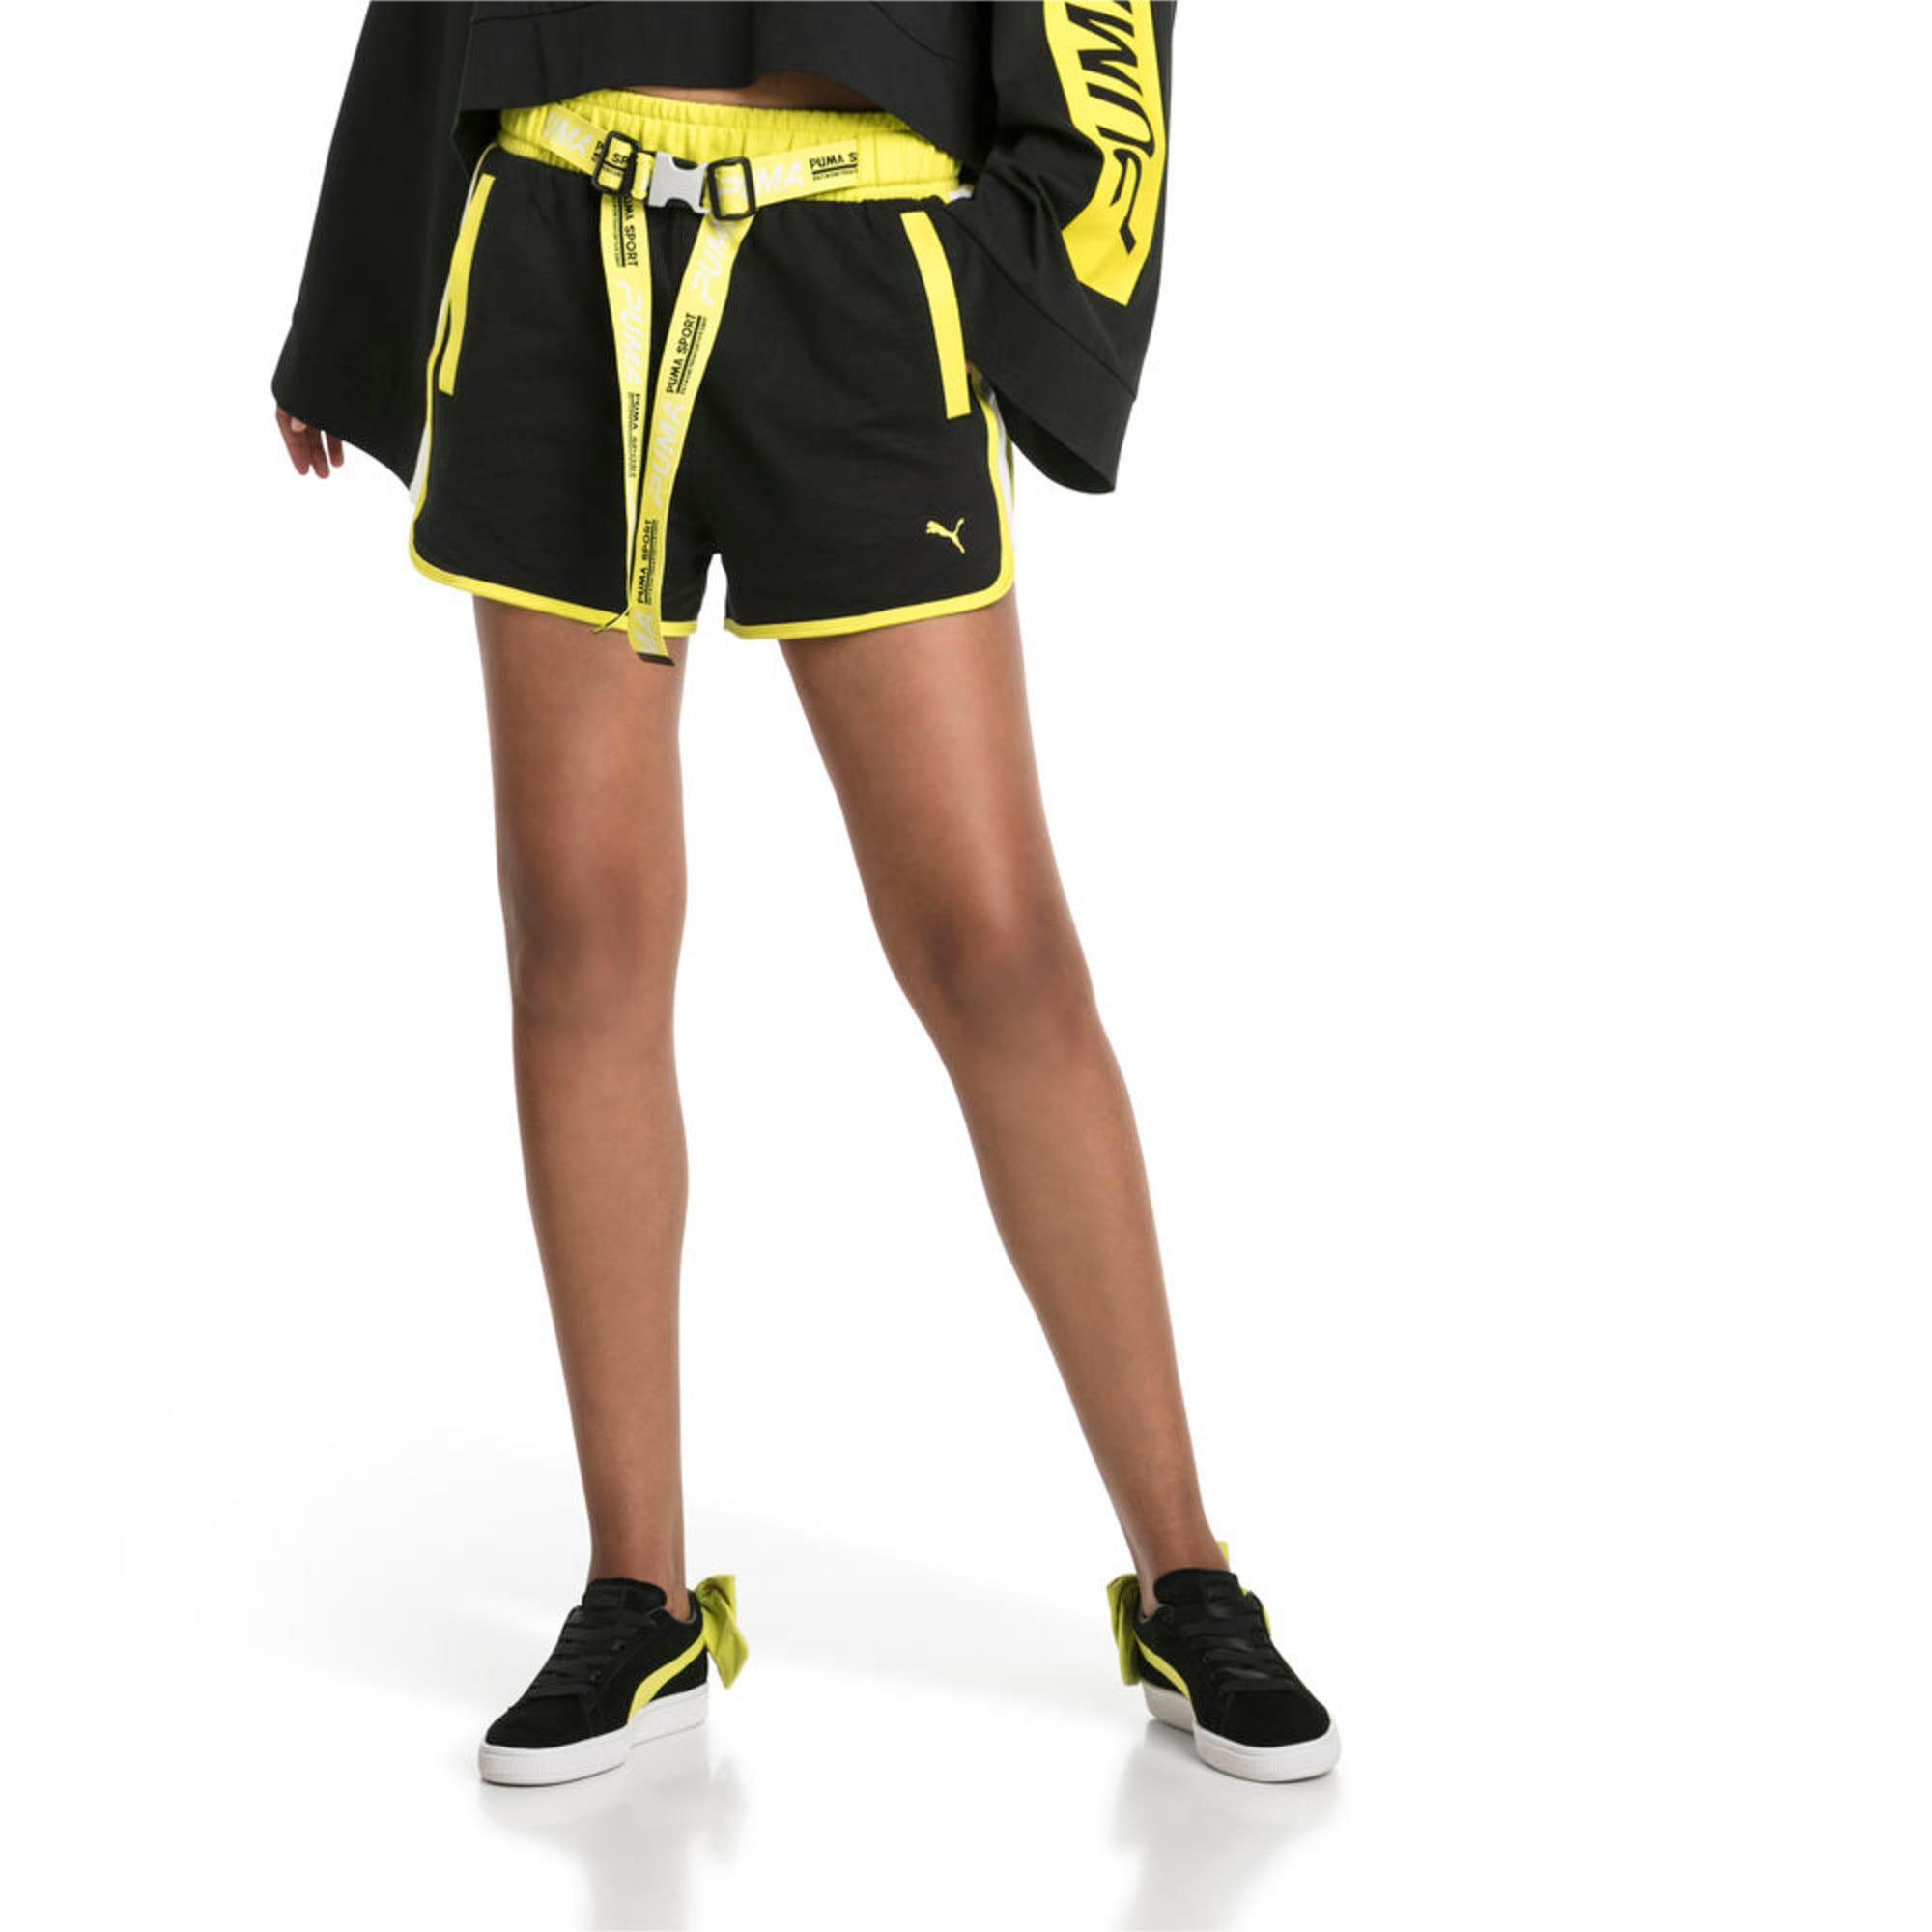 Thumbnail 5 of Archive Women's Xtreme Tape Highwaist Shorts, Cotton Black, medium-IND